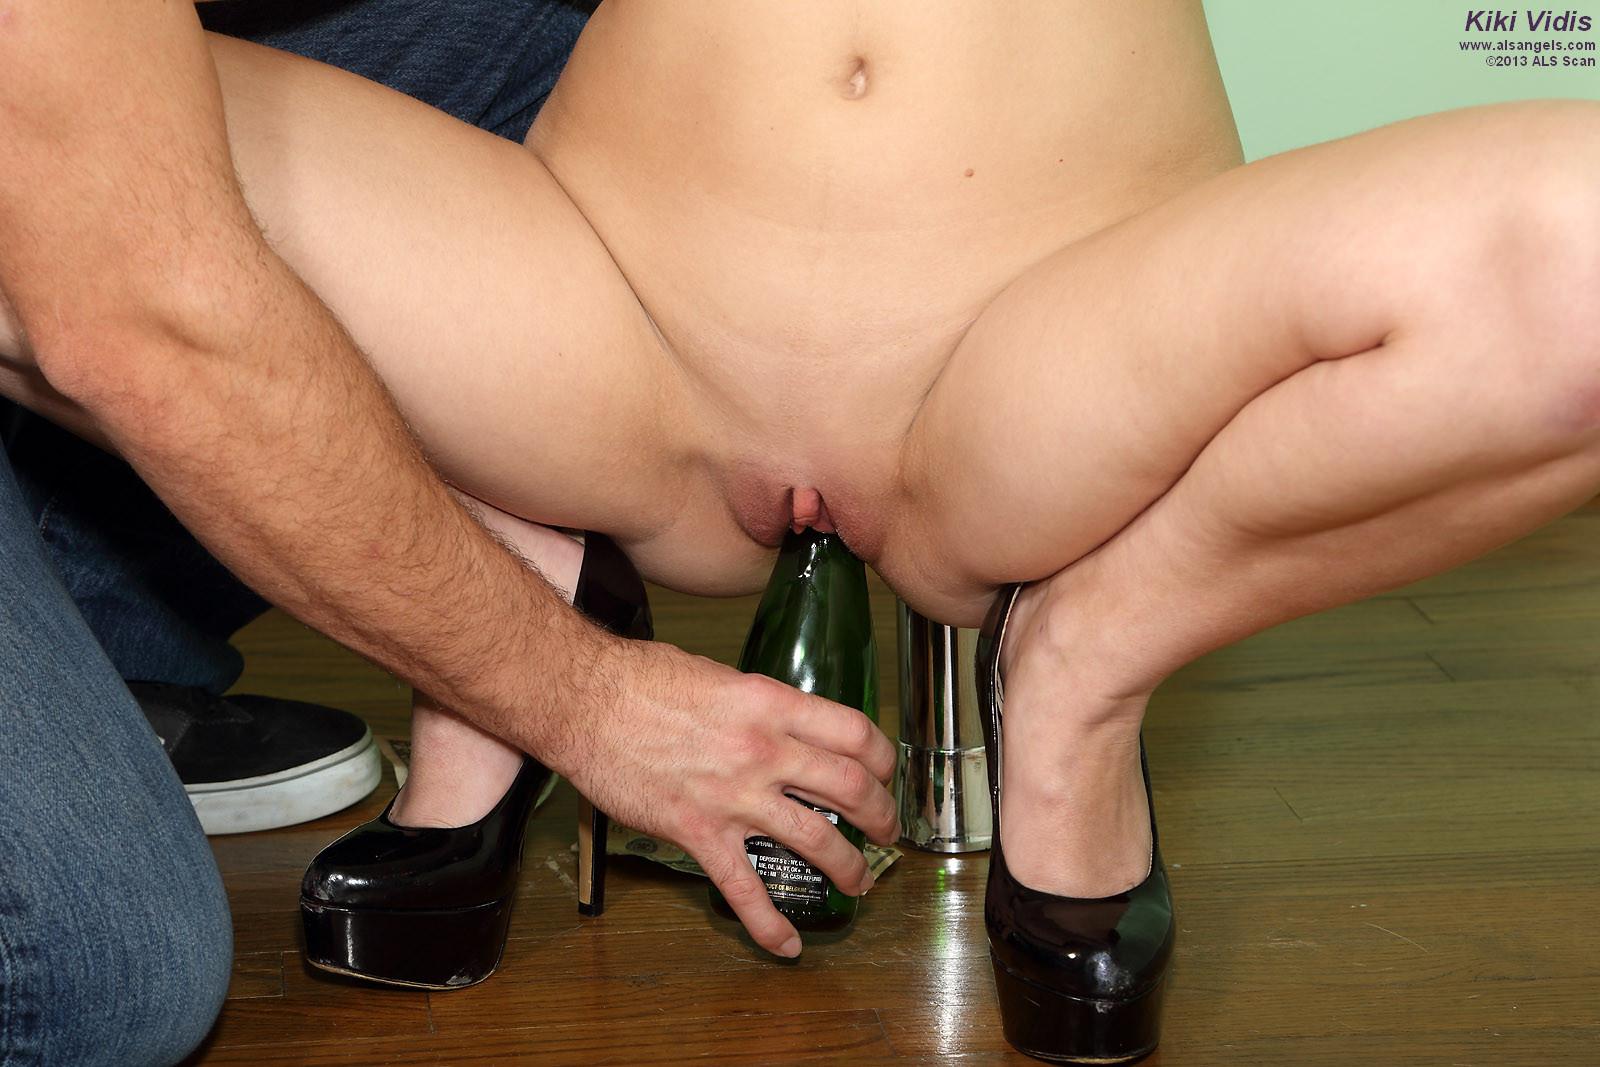 Трахнул стриптизершу бутылкой и дал ей в рот